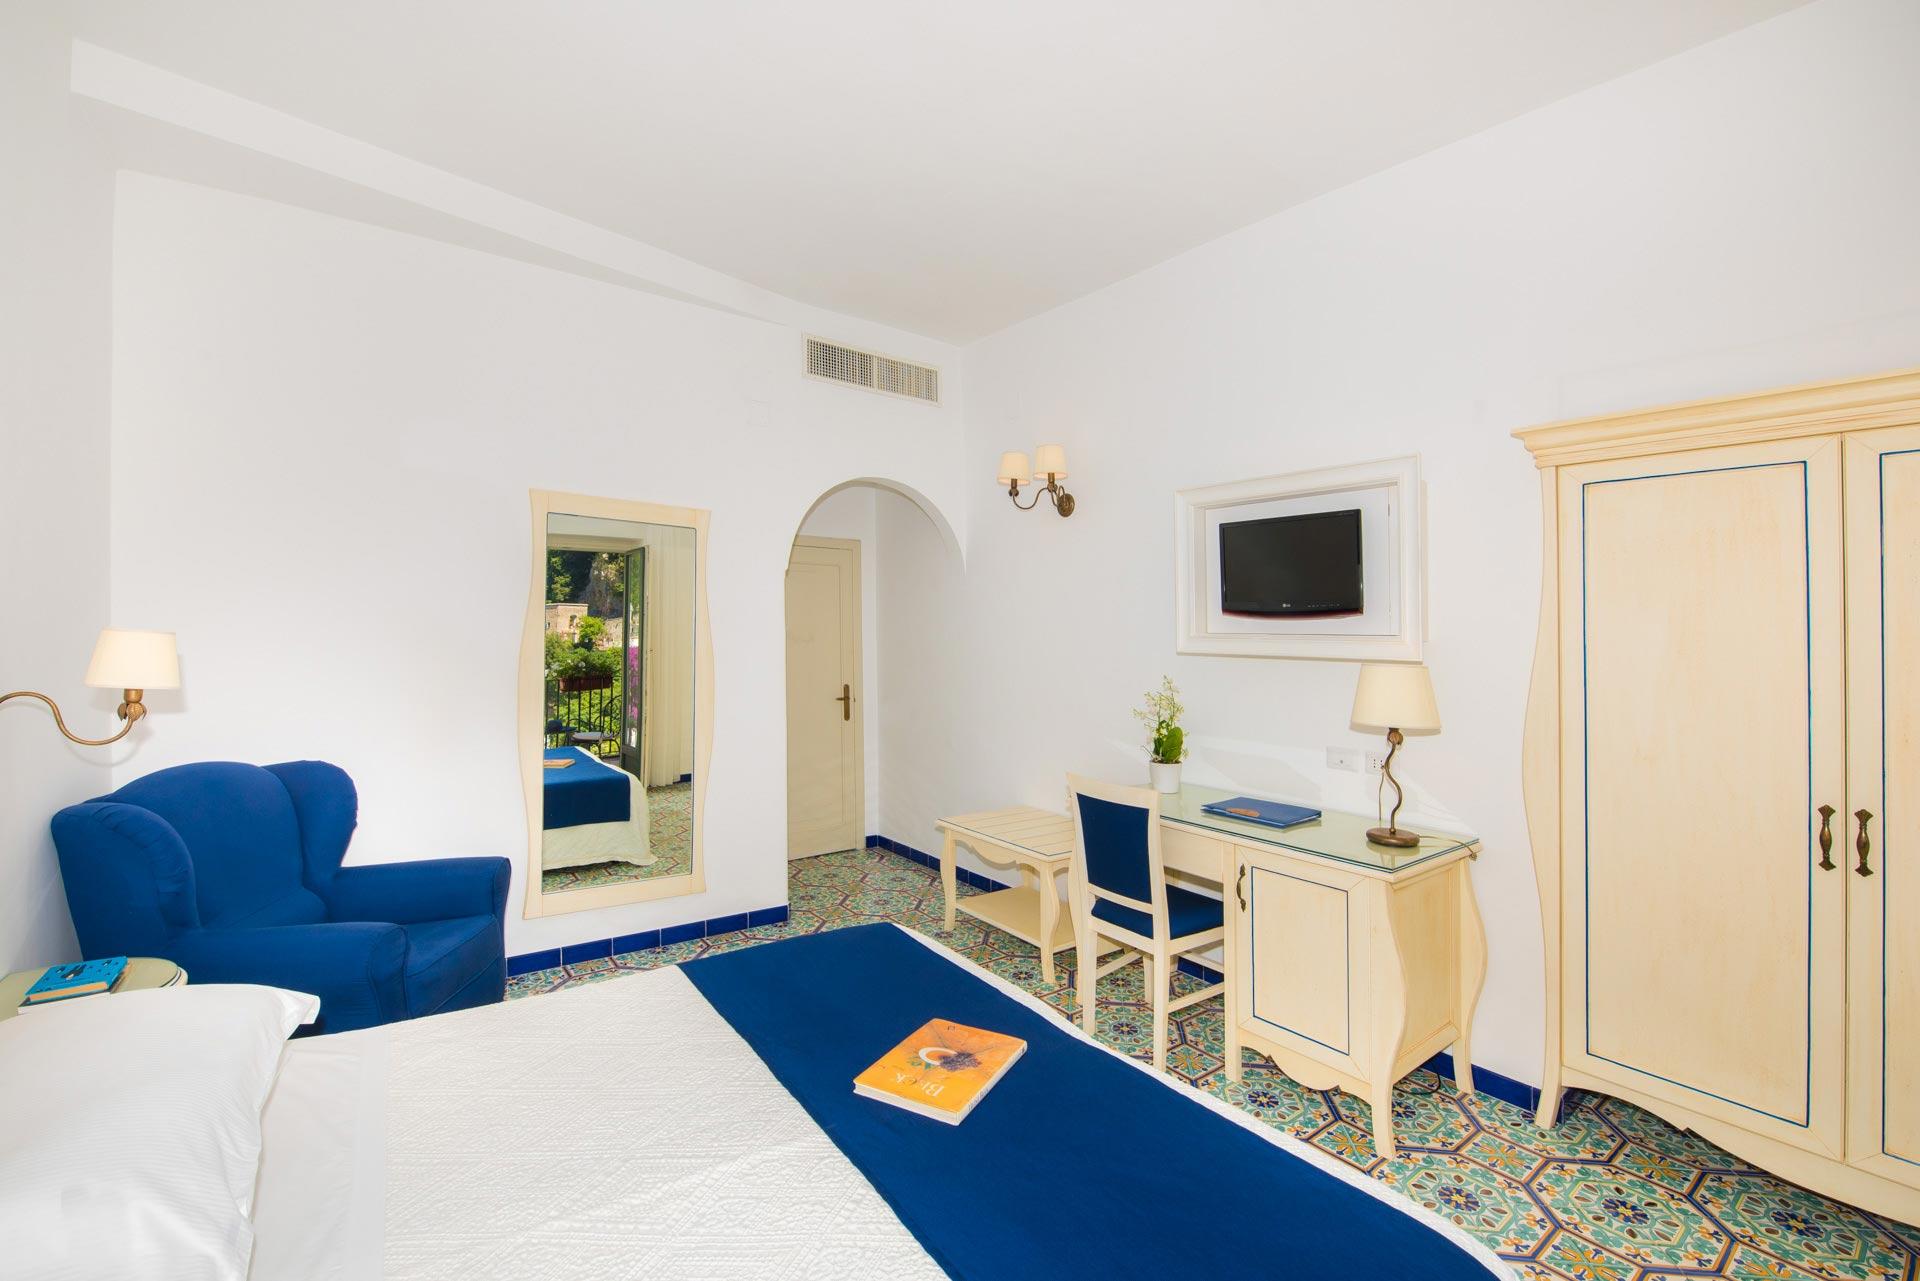 Comfort Room - Hotel Savoia Positano